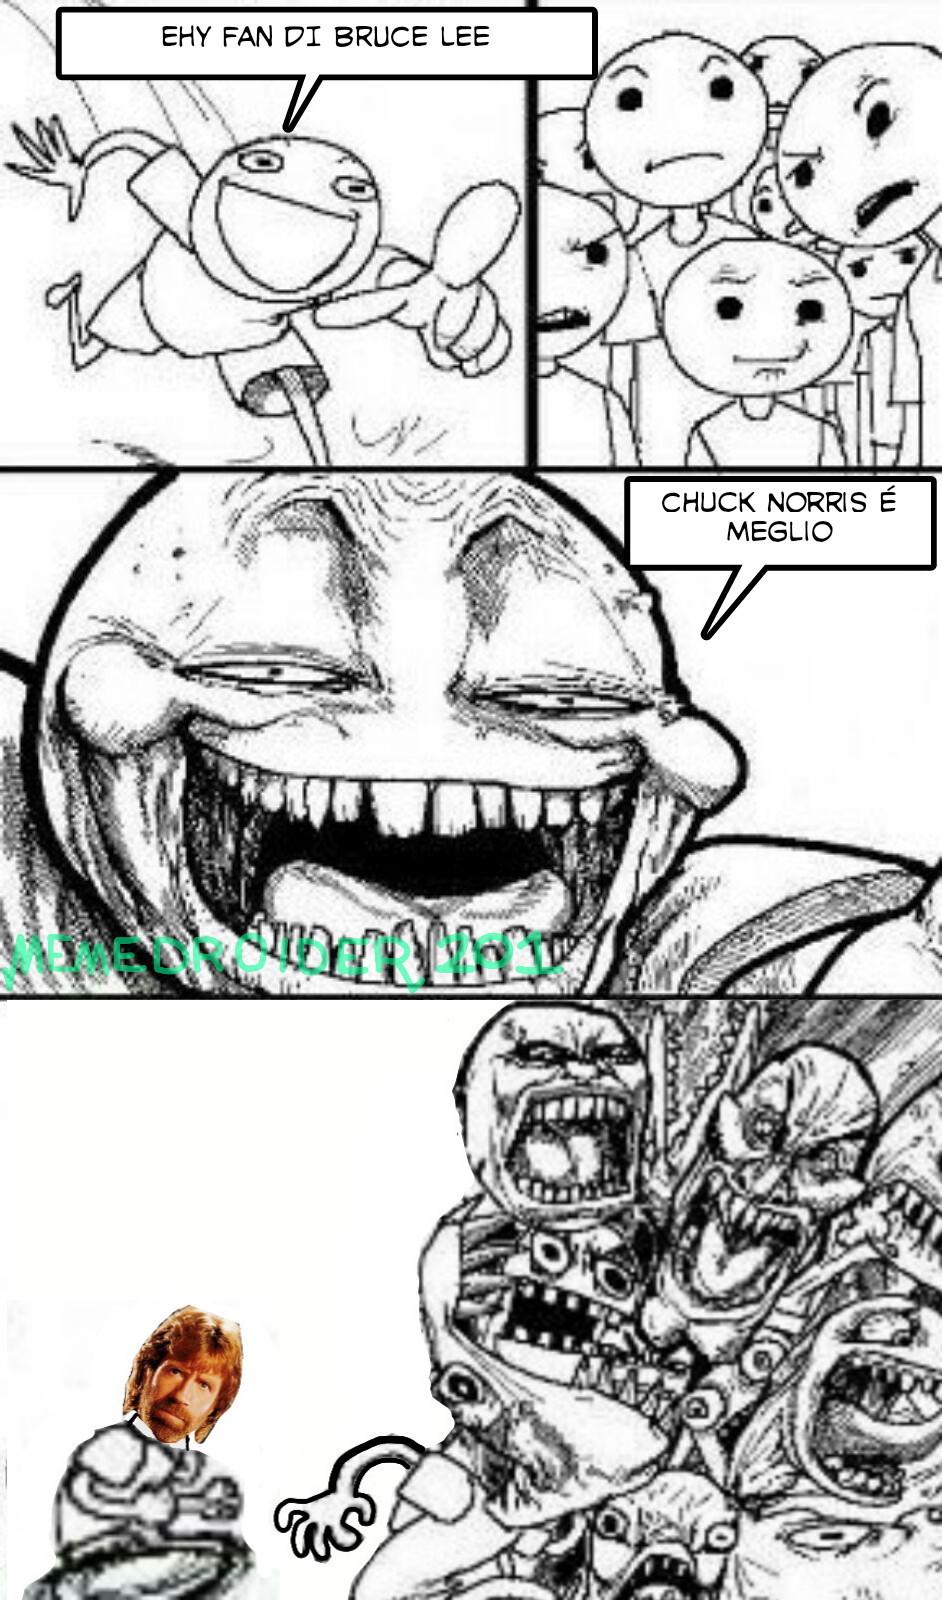 RAGA SIAMO NEL FUTURO - meme